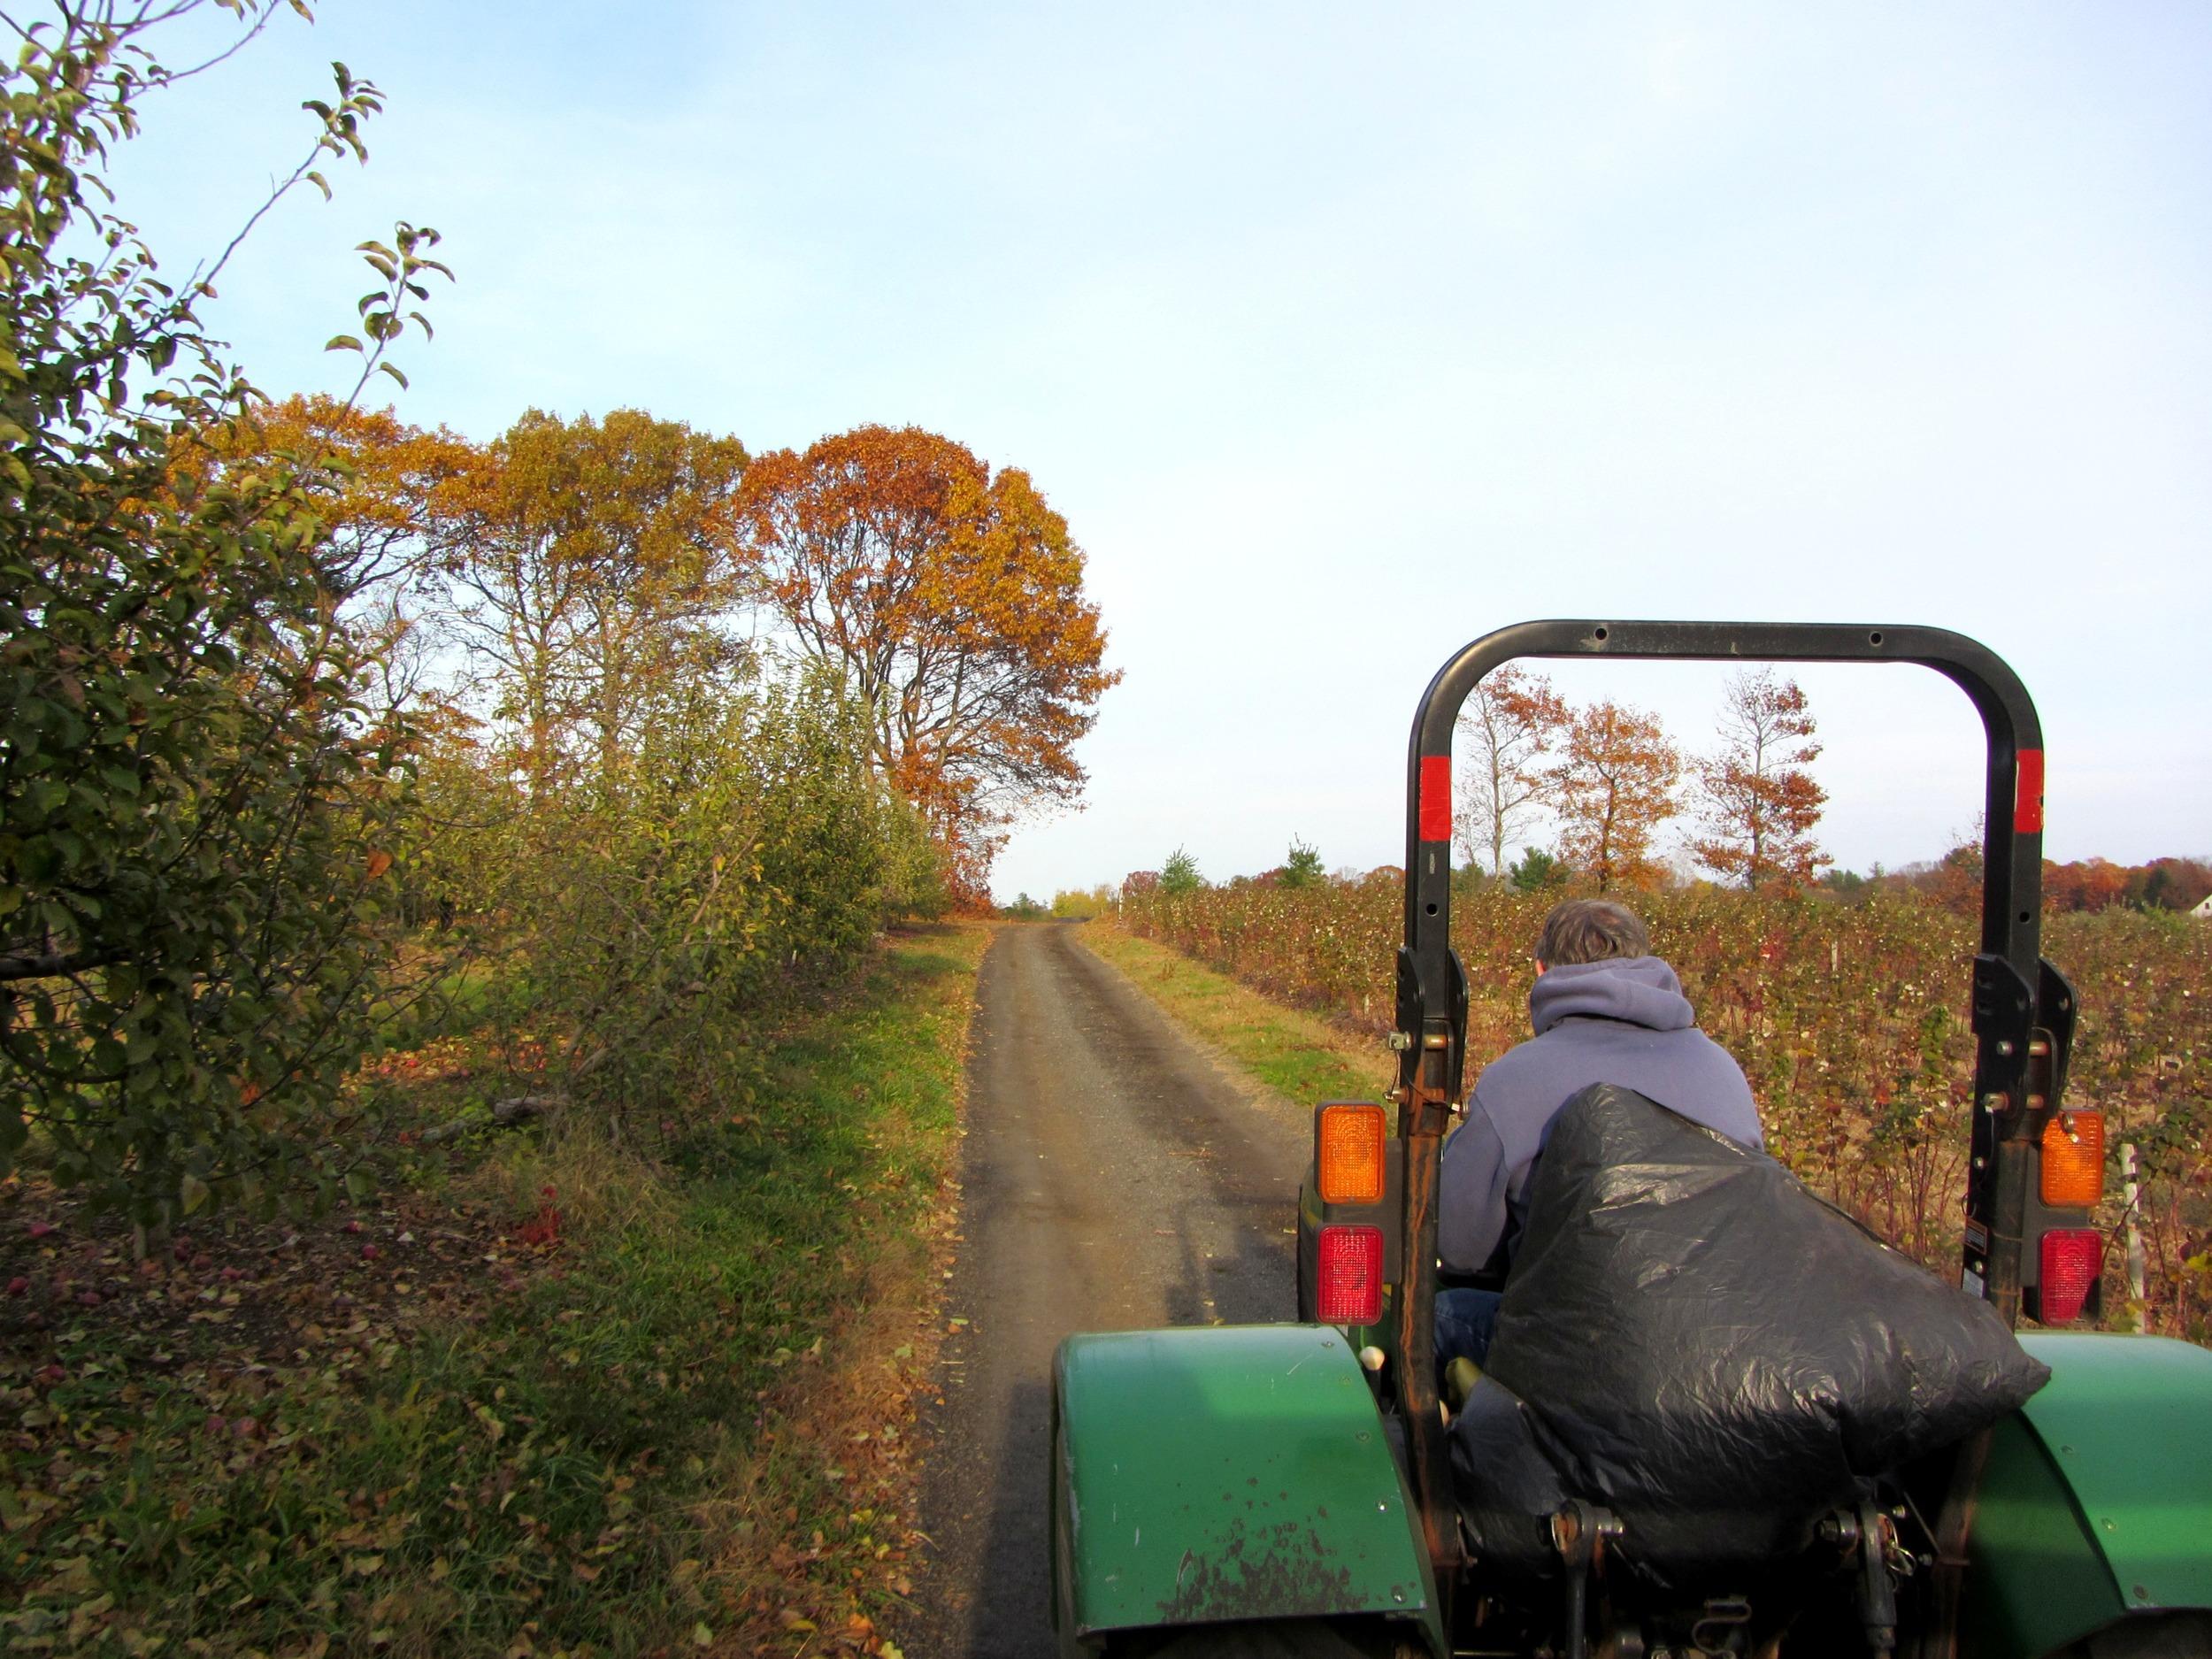 Russell Orchard, Ipswich, Massachusetts | Things to do on Massachusett's North Shore | The Galivant